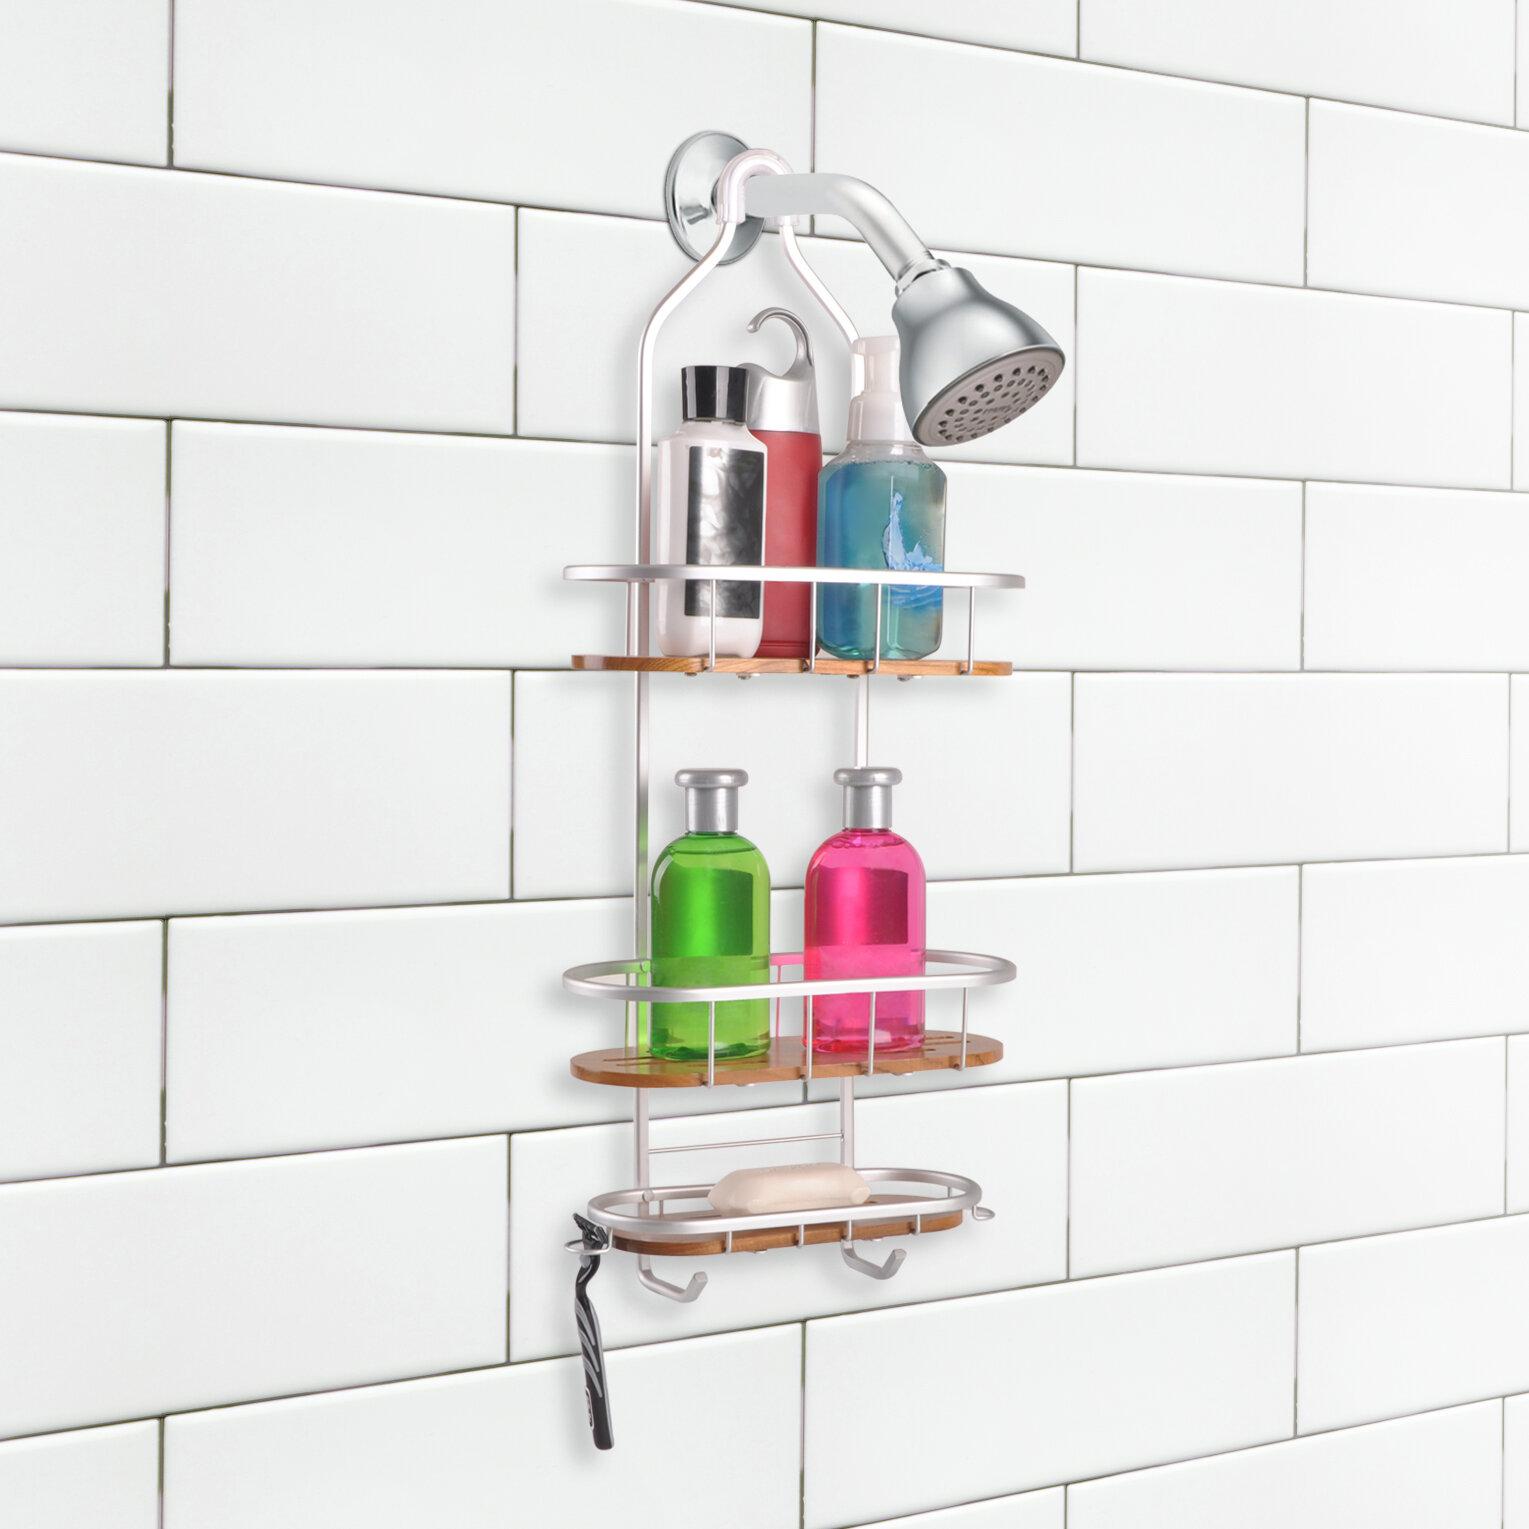 Utopiaalley Teak 3 Shelf Rustproof Shower Caddy Reviews Wayfair